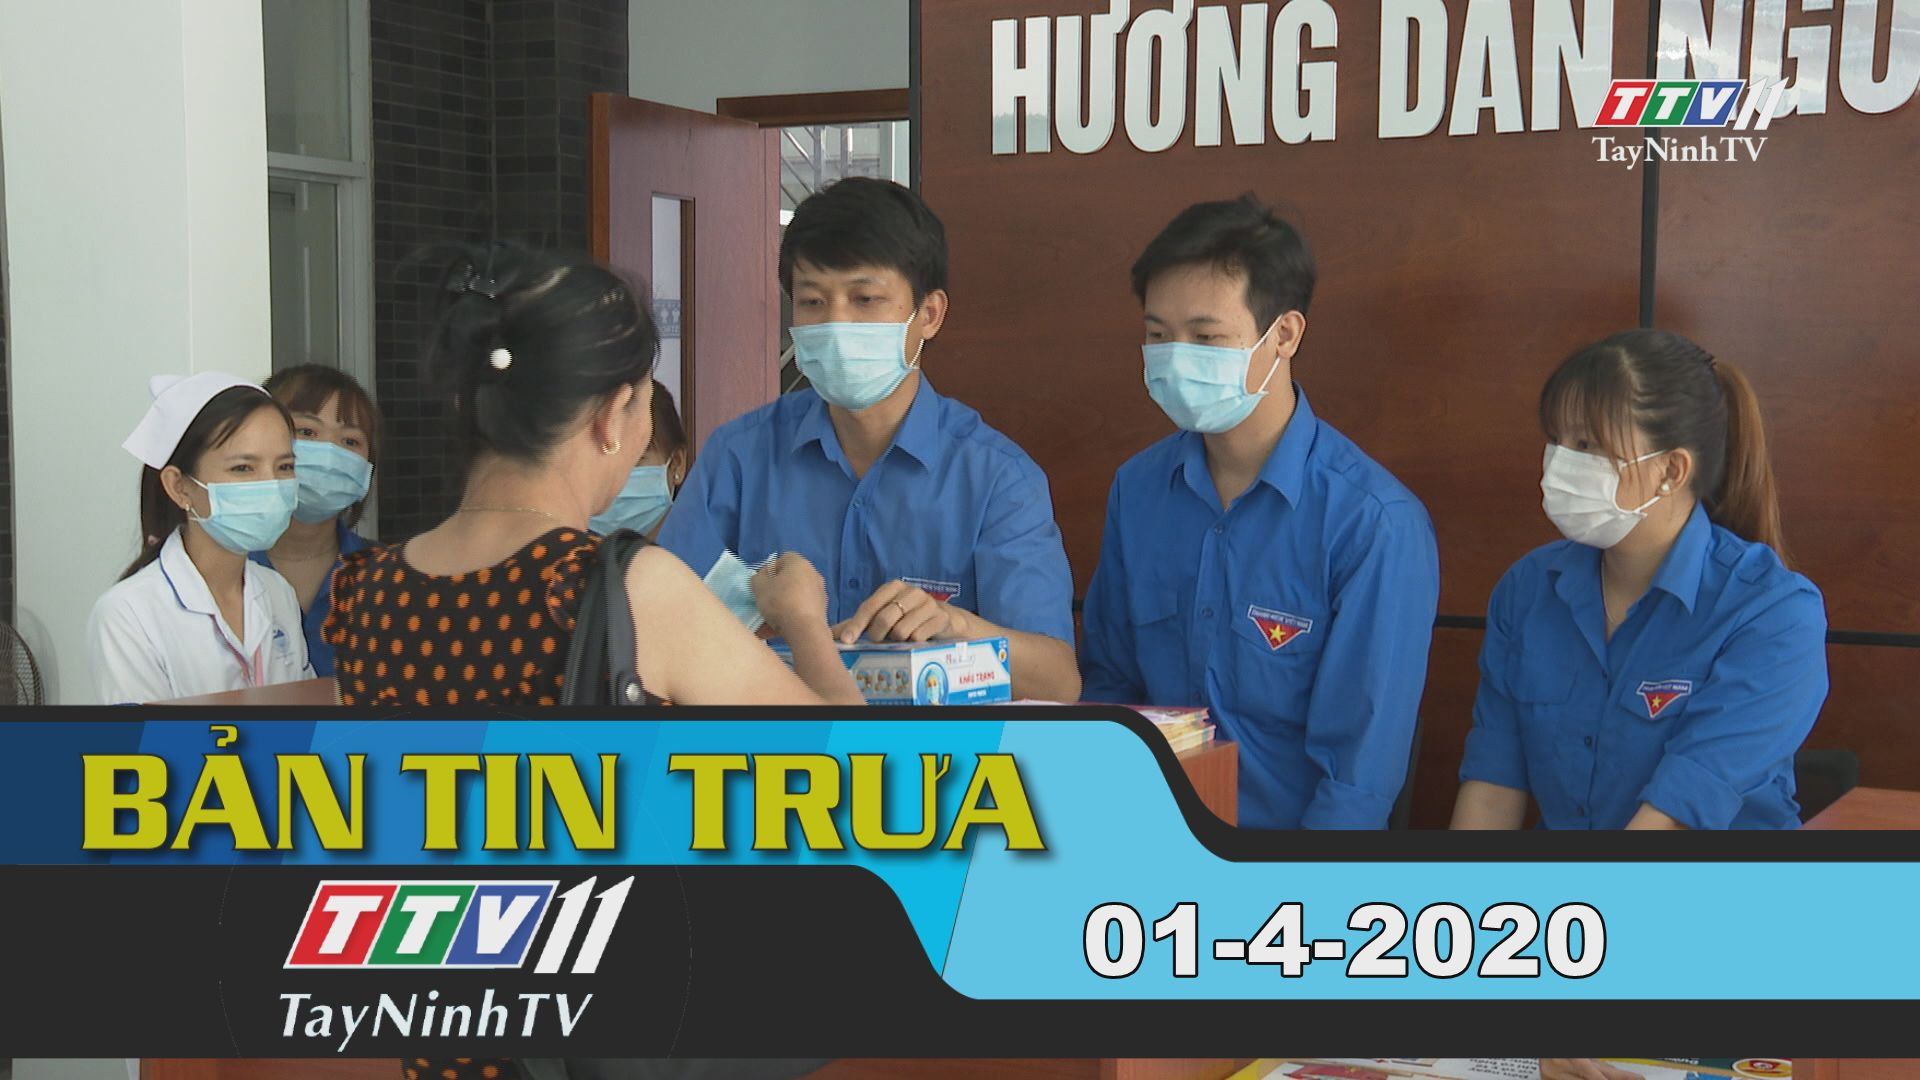 Bản tin trưa 01-4-2020 | Tin tức hôm nay | TayNinhTV